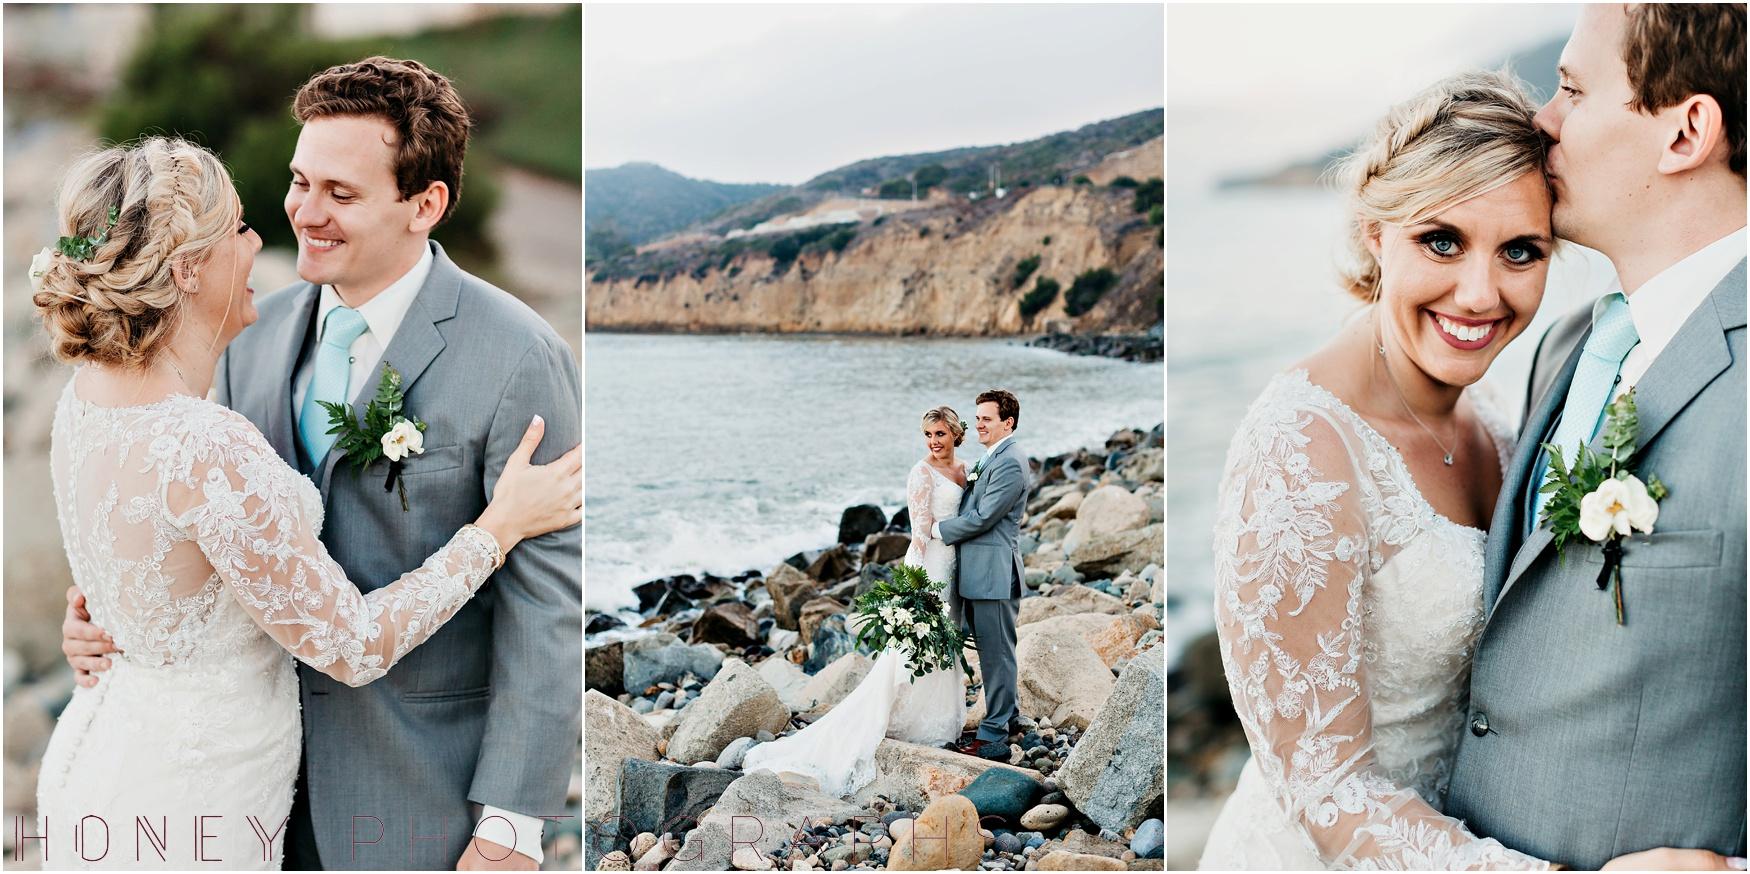 oceanview_point_loma_tropical_beach_ocean_wedding040.jpg